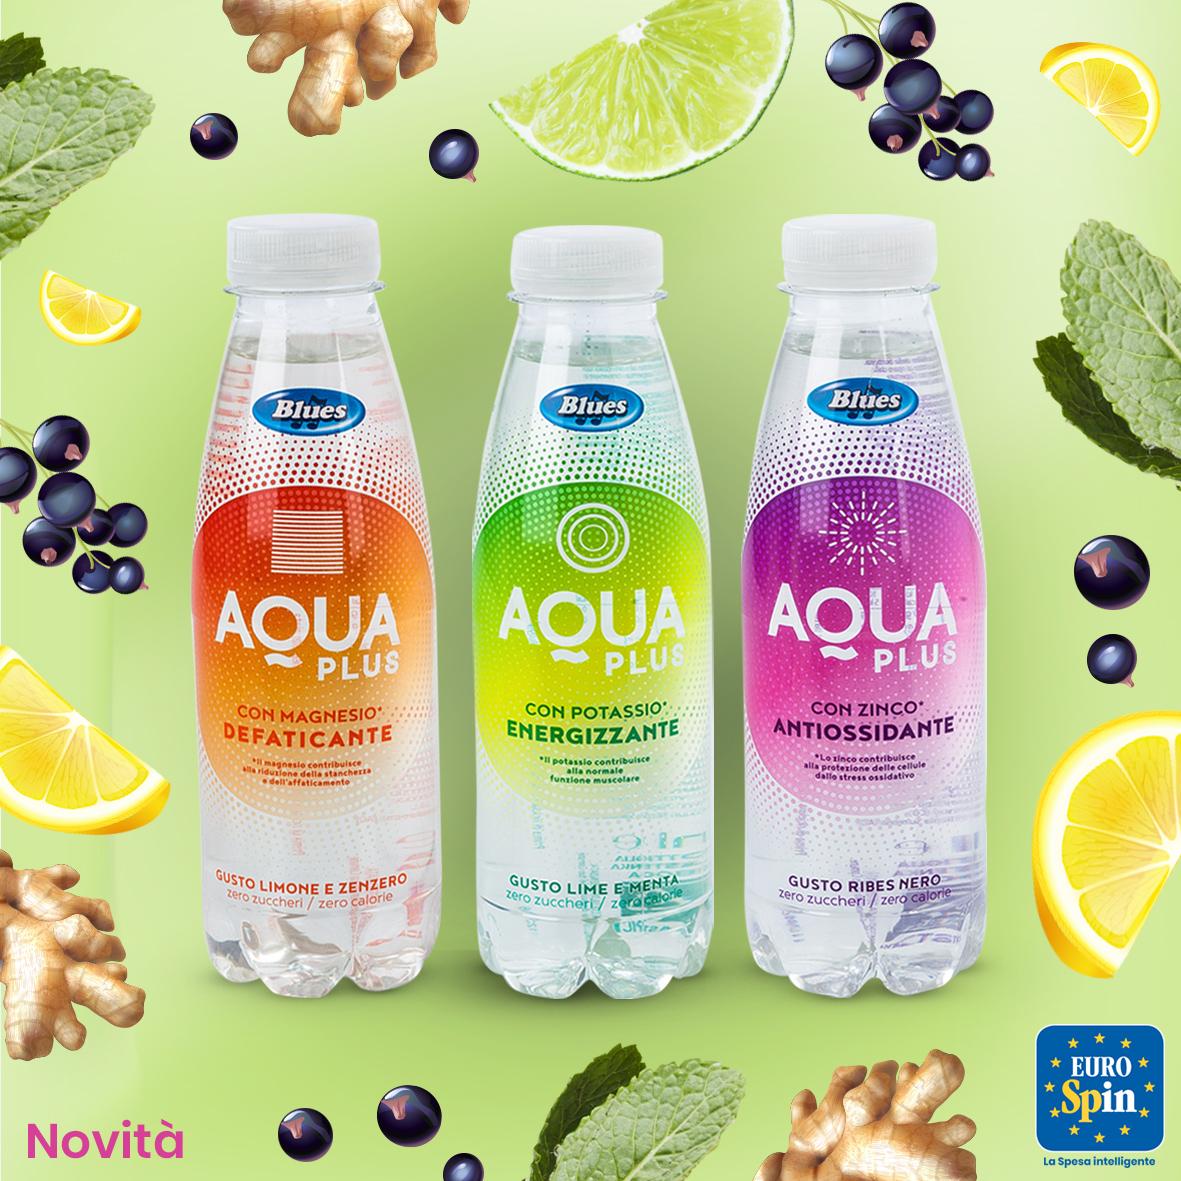 Aqua Plus Blues